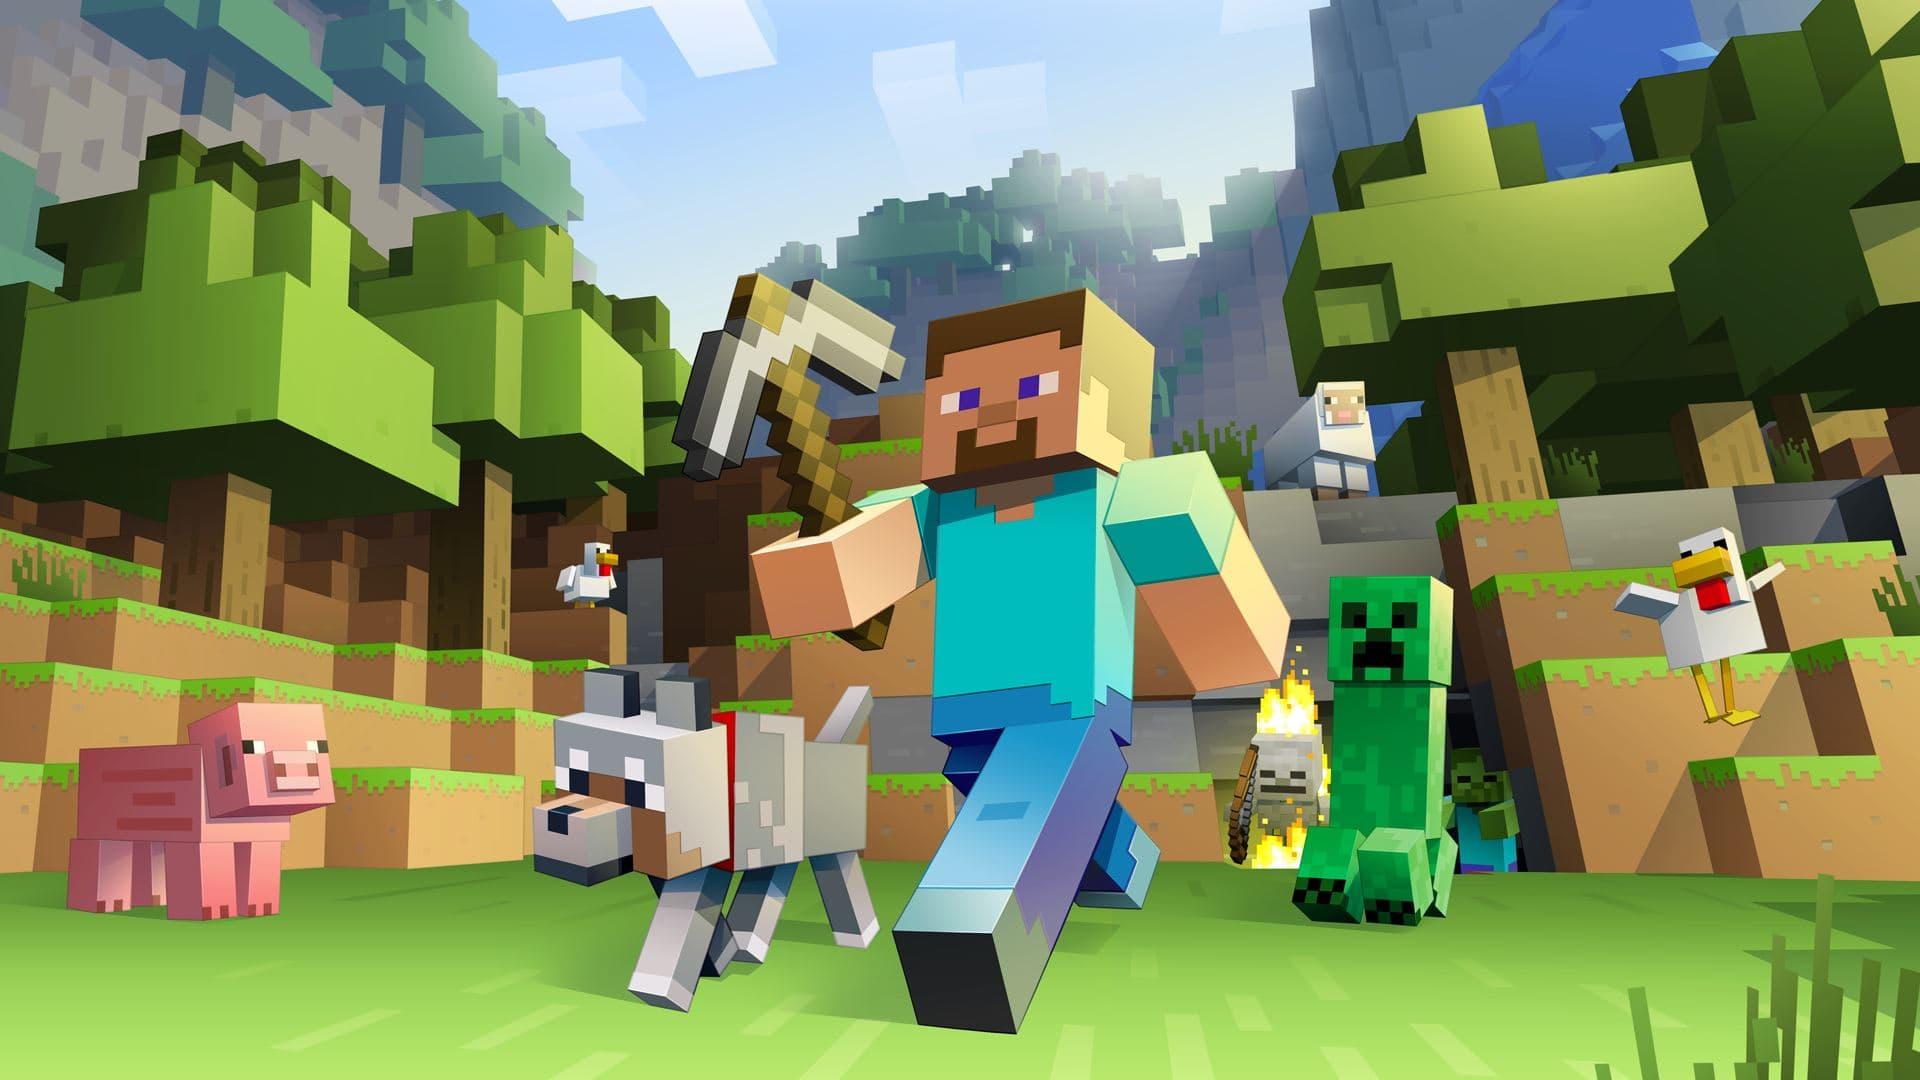 Como Empezar A Jugar A Minecraft Tutorial Para Principiantes